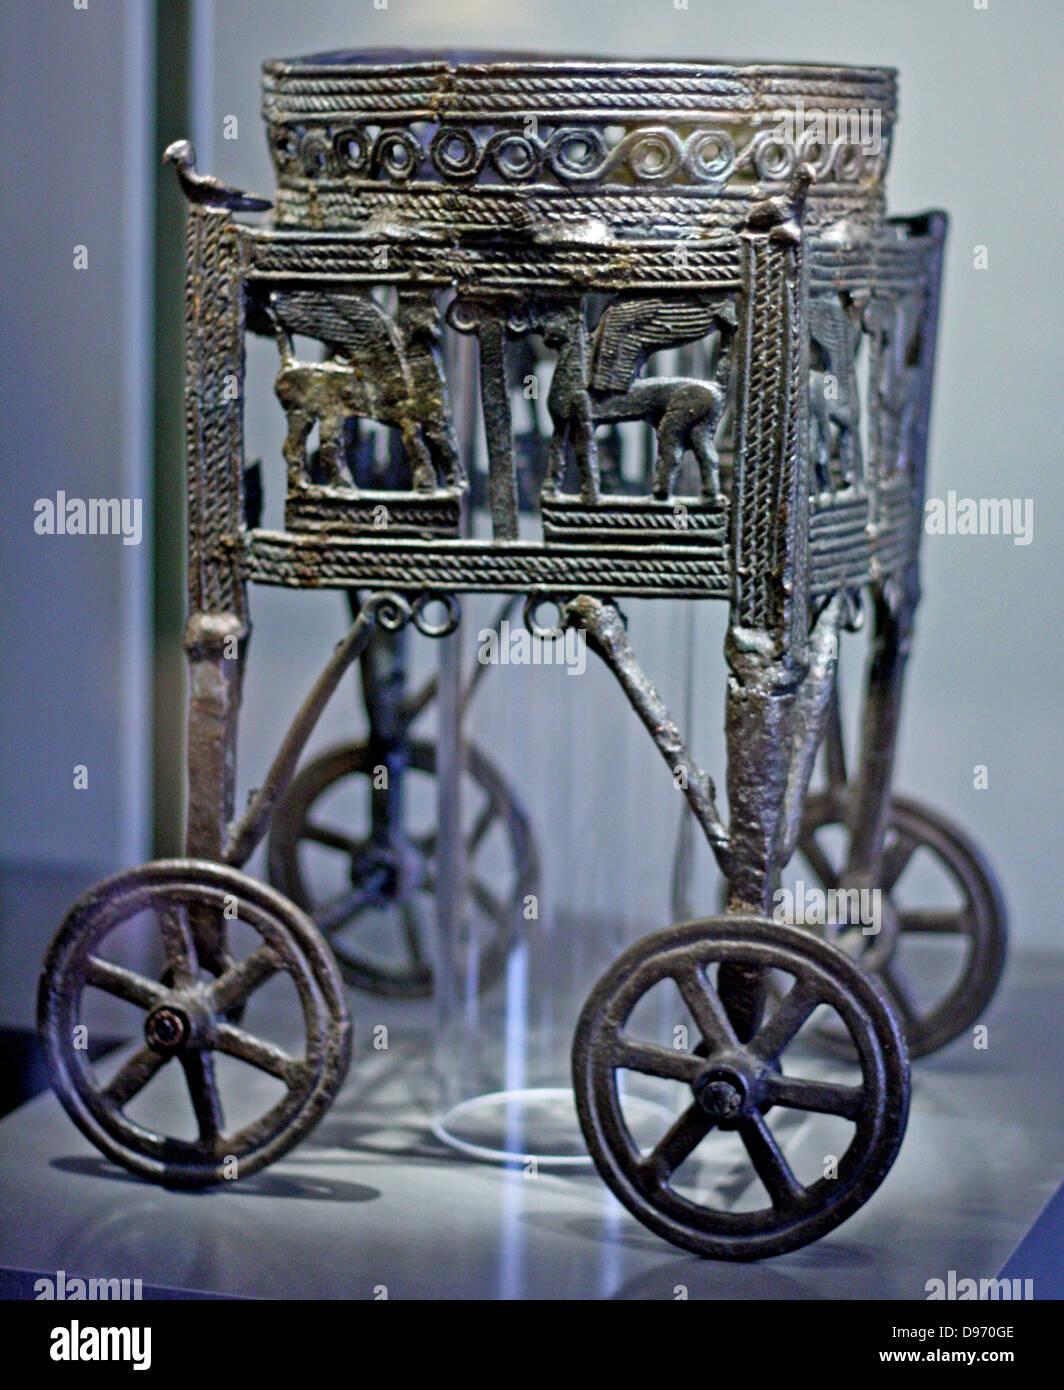 Wheeled bronze wagon built for a cauldron 12-11 th century BC from Larnaka Cyprus, Greek. Stock Photo